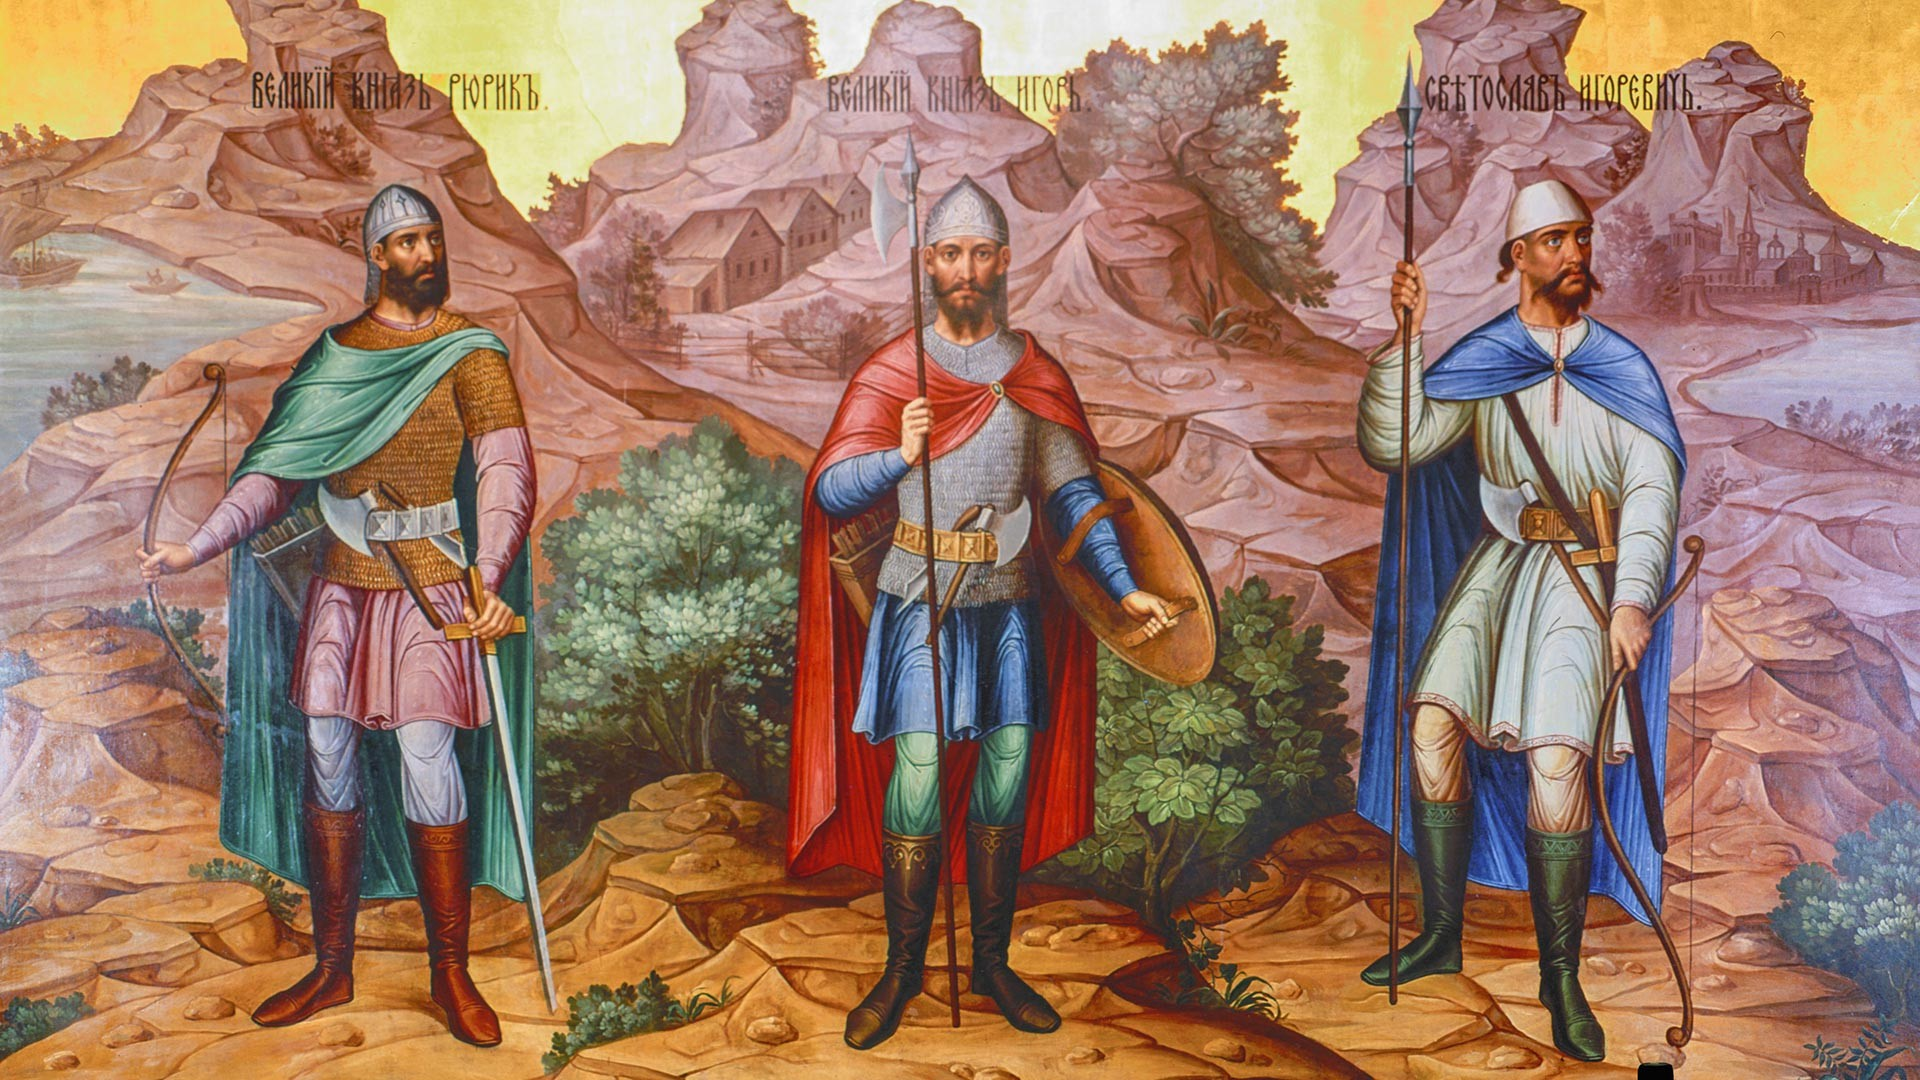 Les princes Riourik, Igor et Igor Sviatoslavitch. Reproduction d'une peinture murale